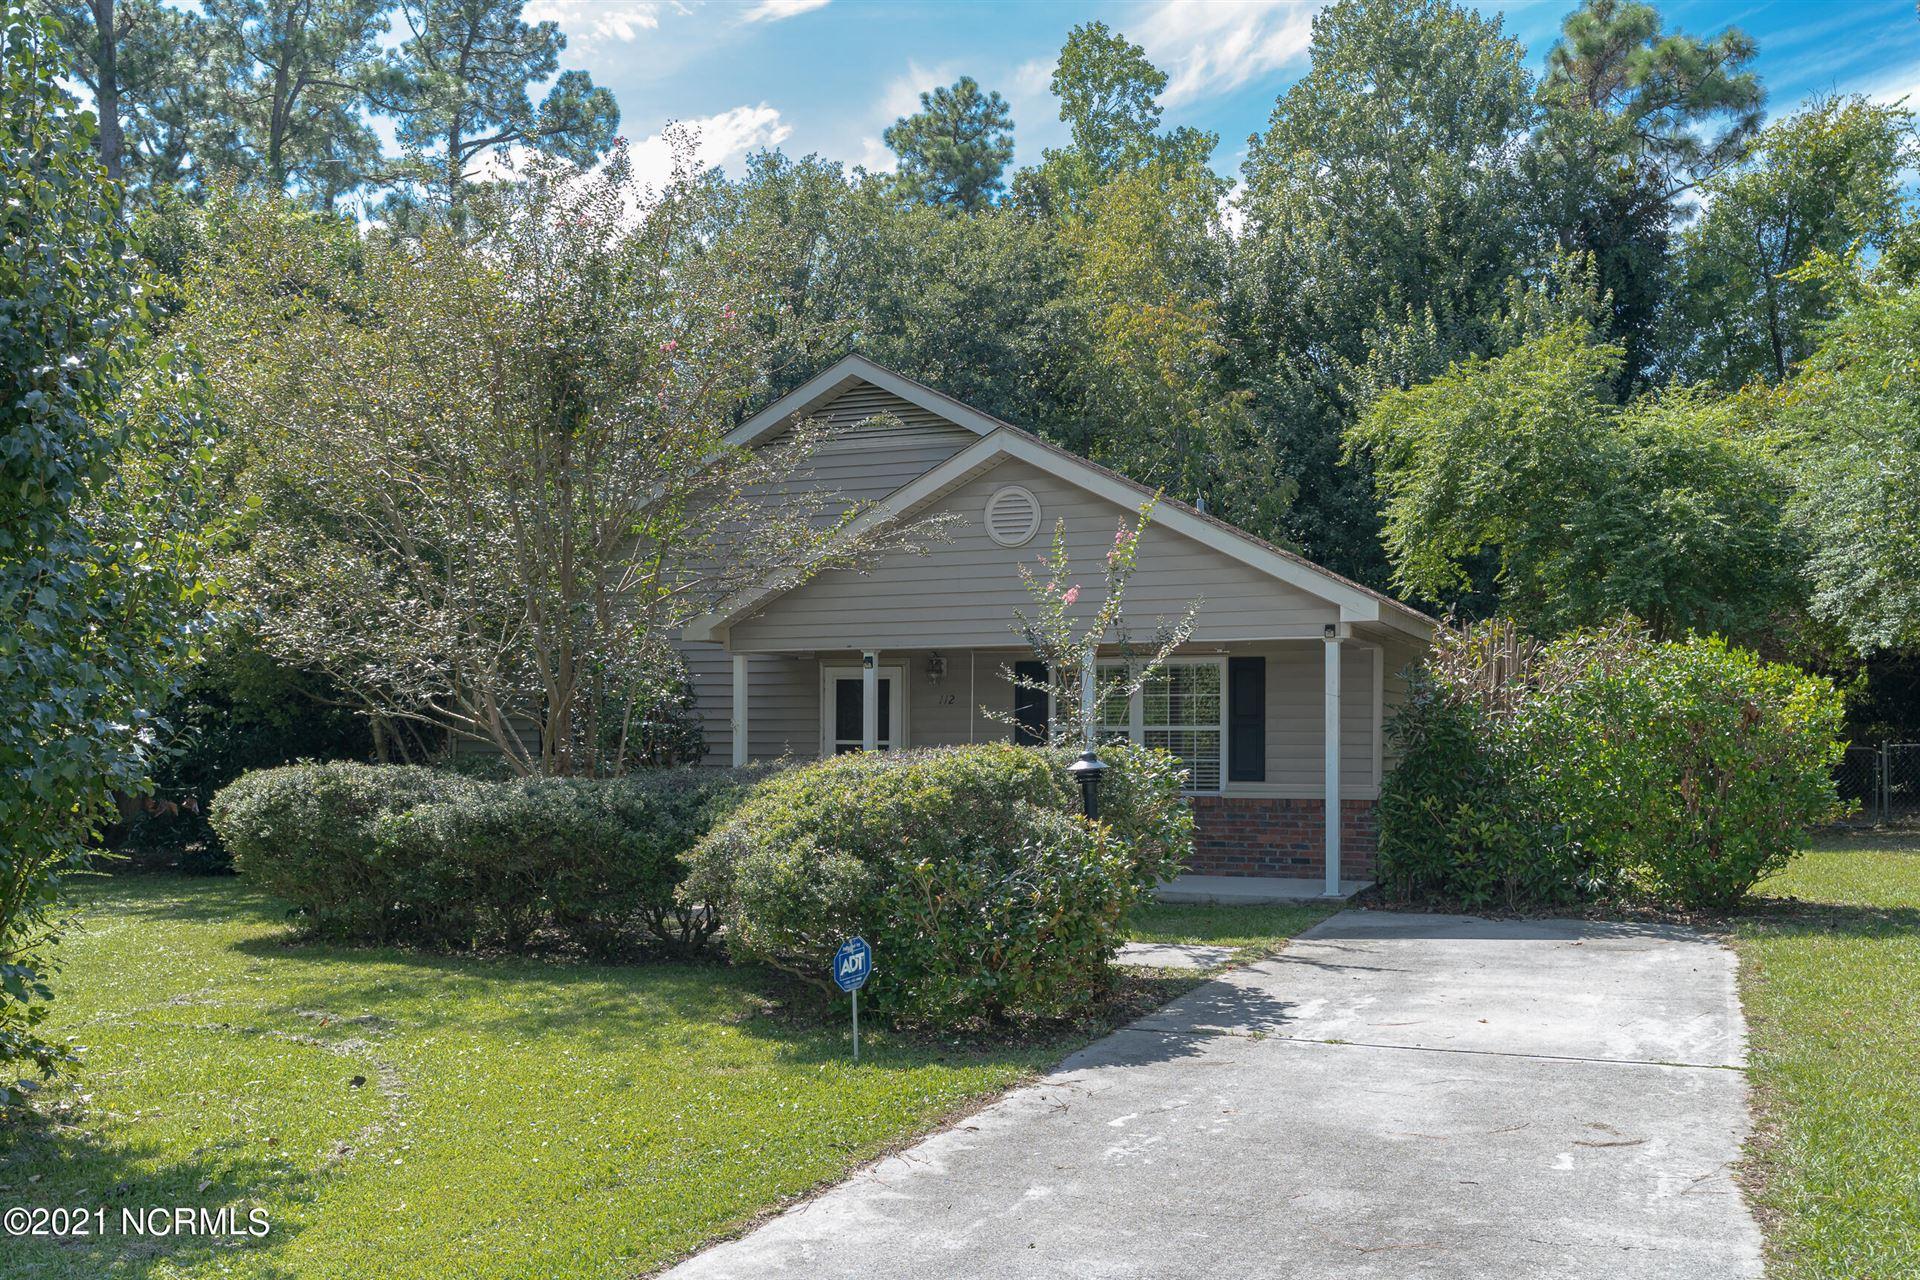 Photo of 112 S Crestwood Road, Wilmington, NC 28405 (MLS # 100290747)